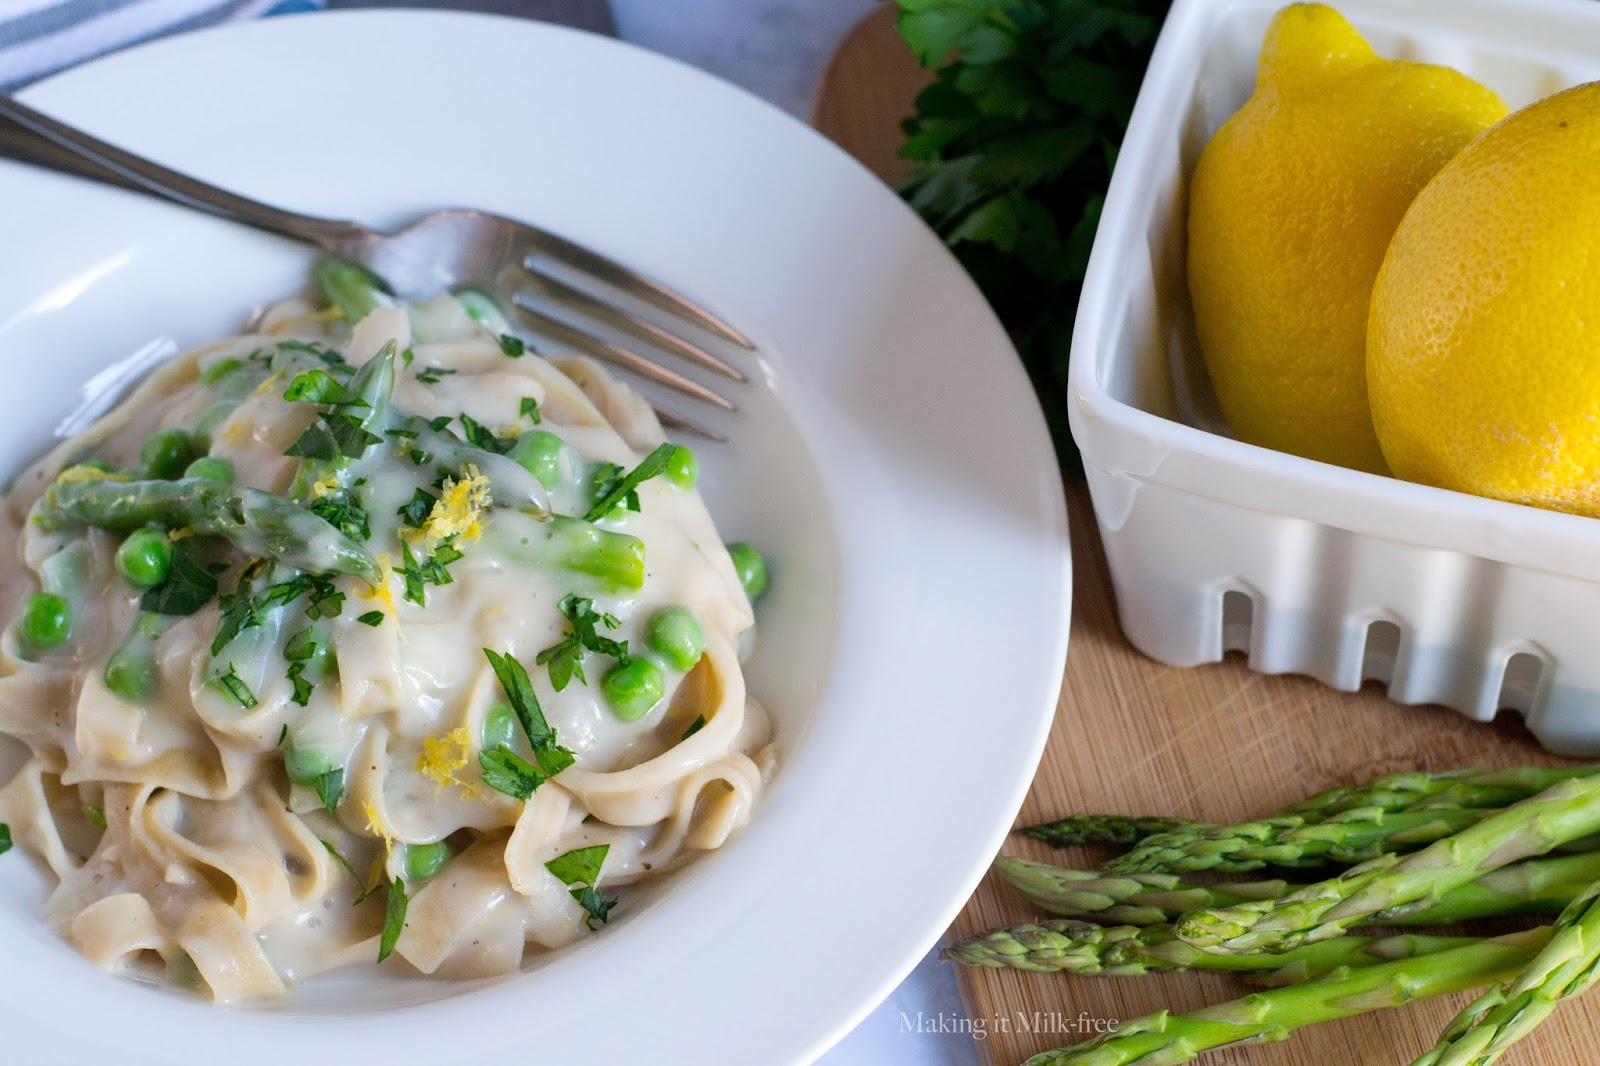 Pasta with Savory Lemon Cream Sauce from Making it Milk-free